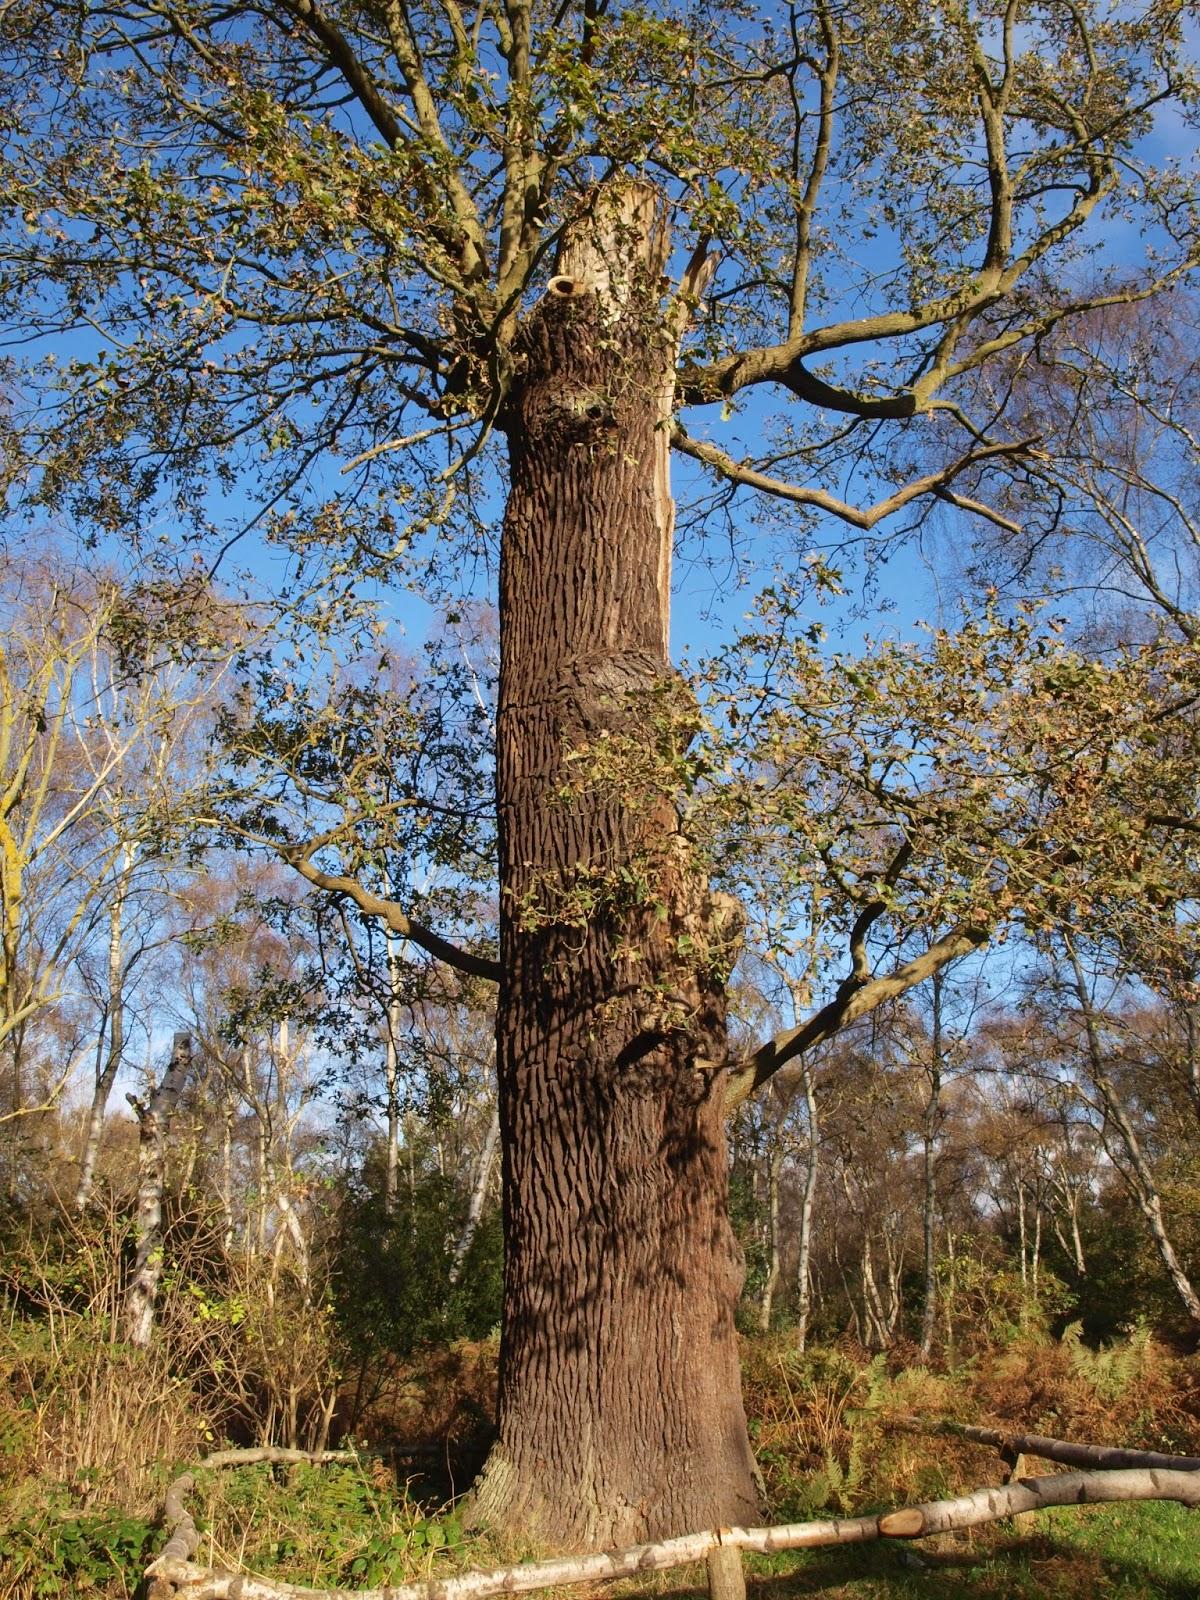 Ragged Robin\'s Nature Notes: Ancient Oaks, Robin Hood and the Green Man